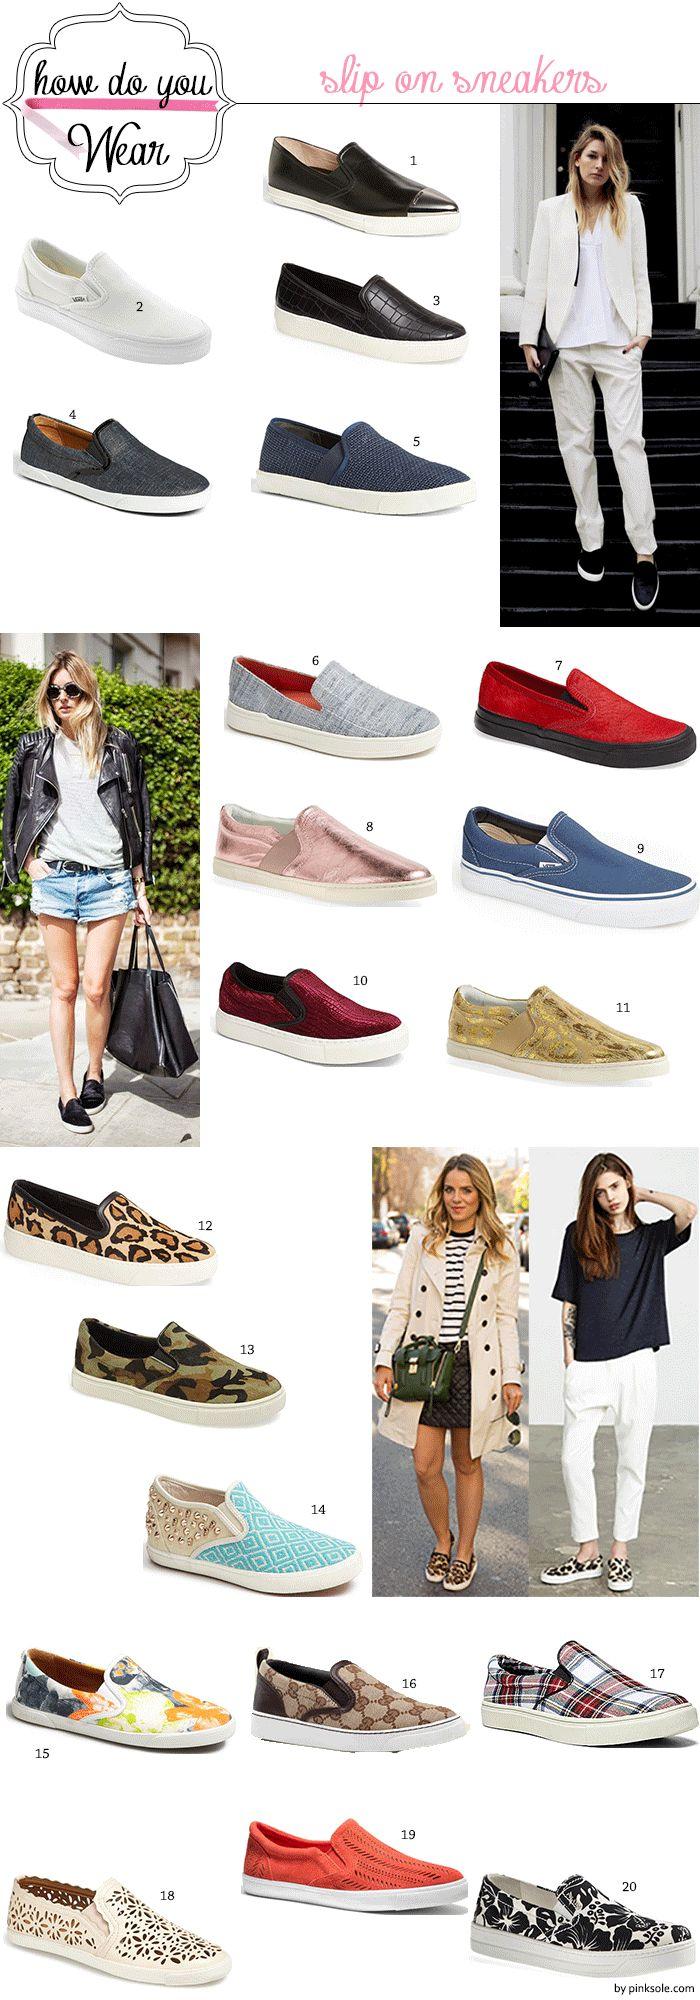 The best slip-on sneaker | How to wear slip-on sneakers my favorite kind of shoe